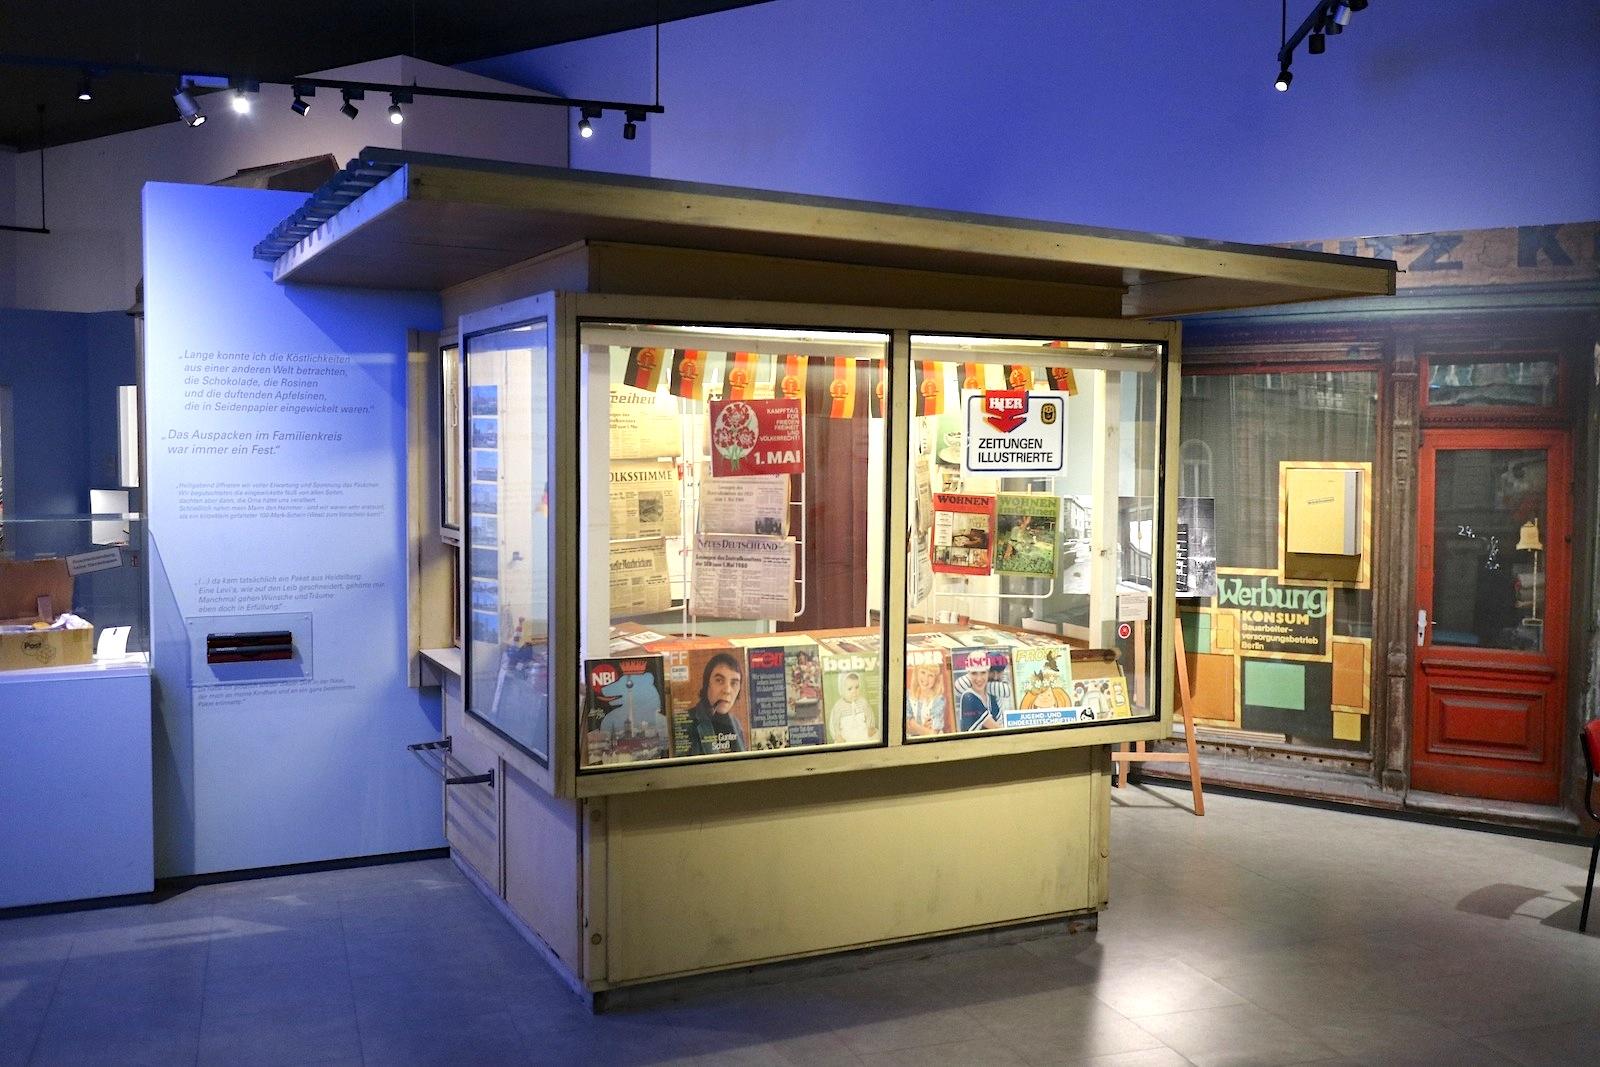 Museum in der Kulturbrauerei. Originaler Zeitungskiosk